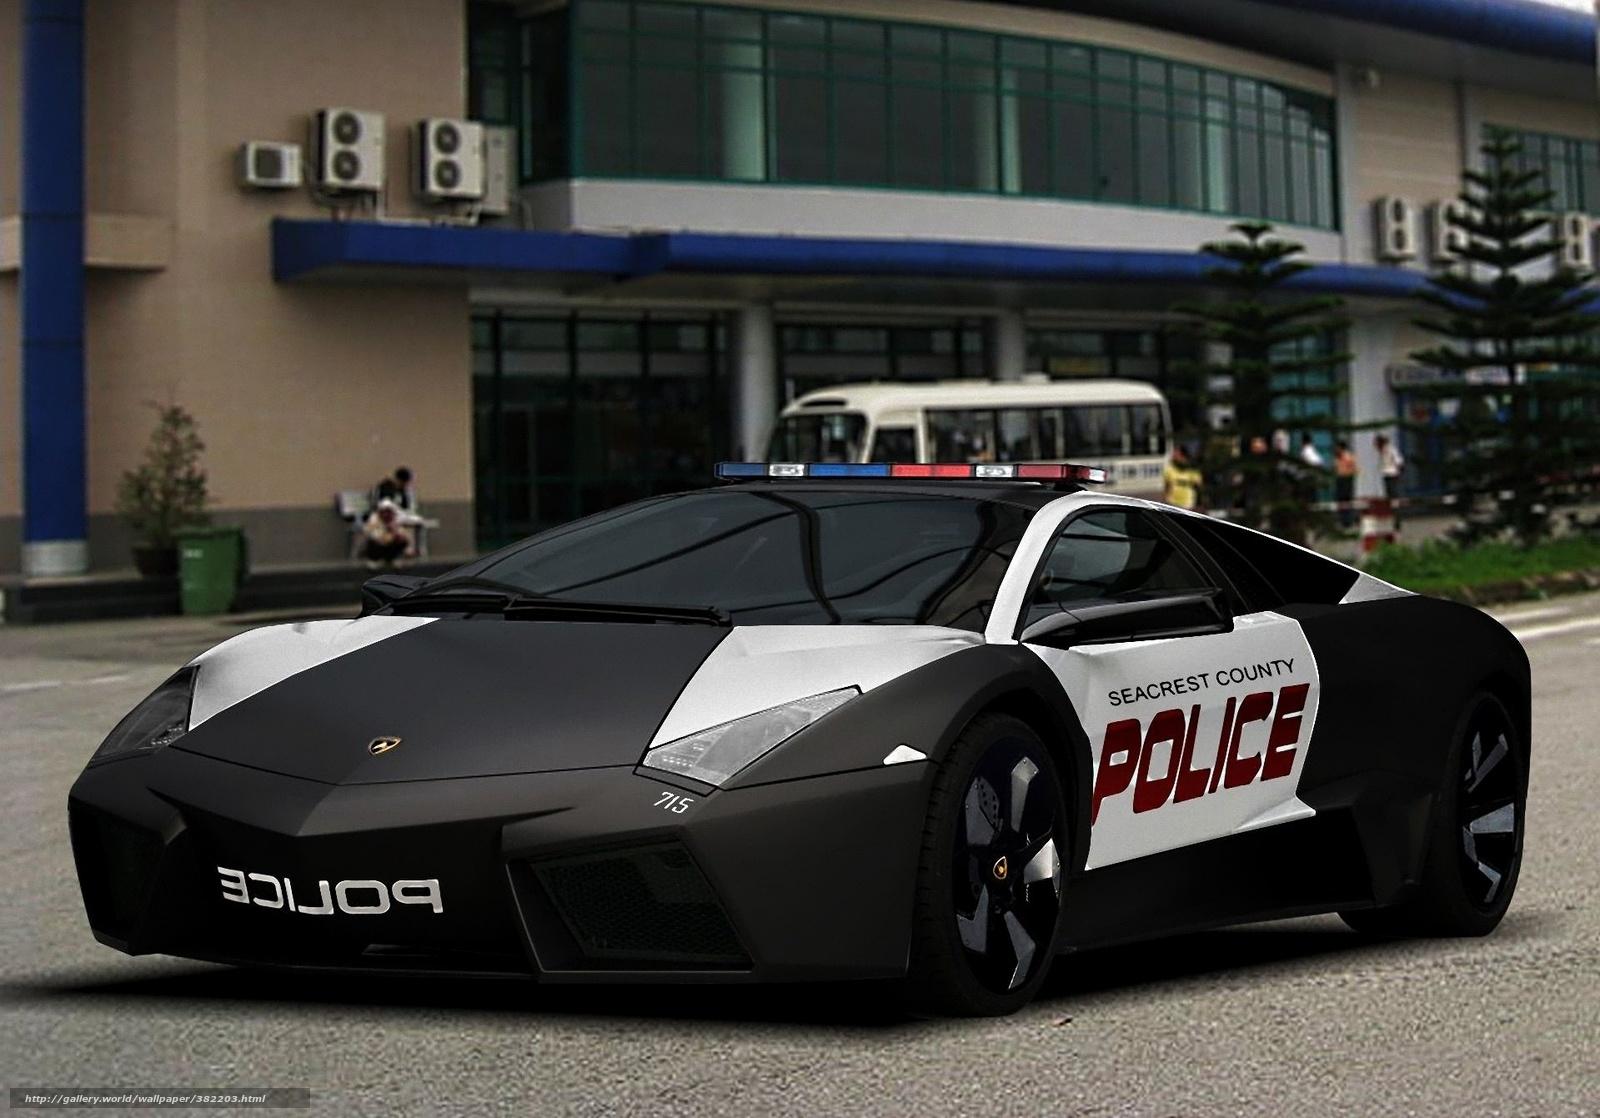 wallpaper Car police Lamborghini cars desktop wallpaper 1600x1118